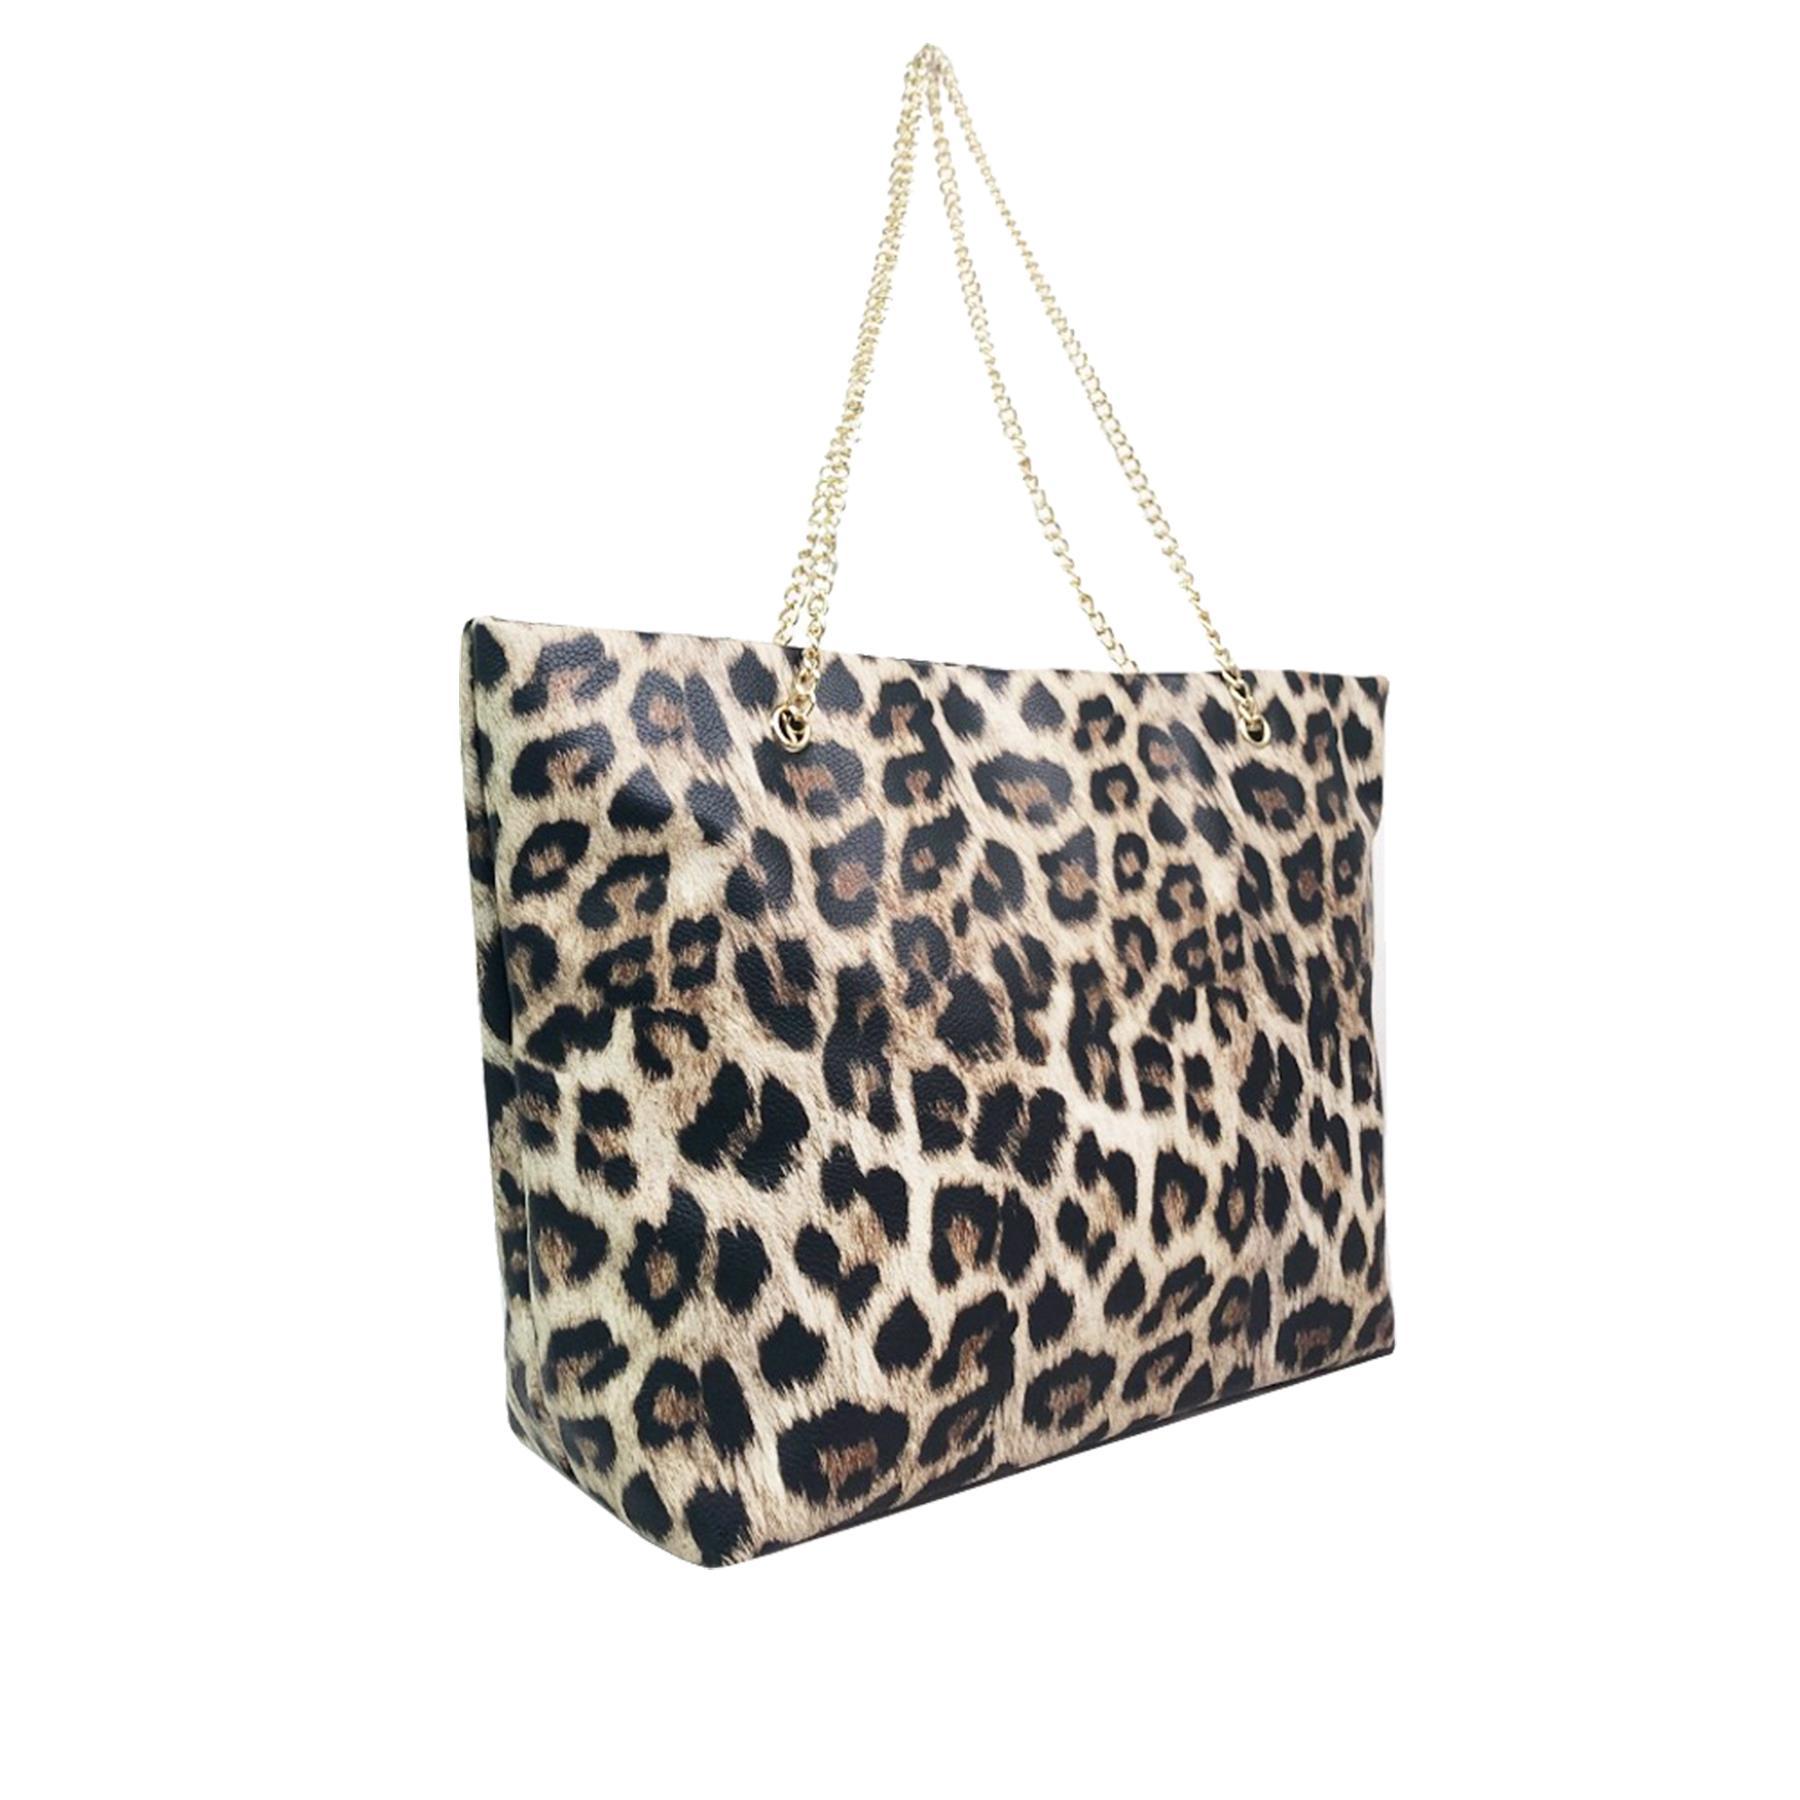 New-Women-s-Zebra-Leopard-Print-Faux-Leather-Fashion-Shoulder-Bags thumbnail 9